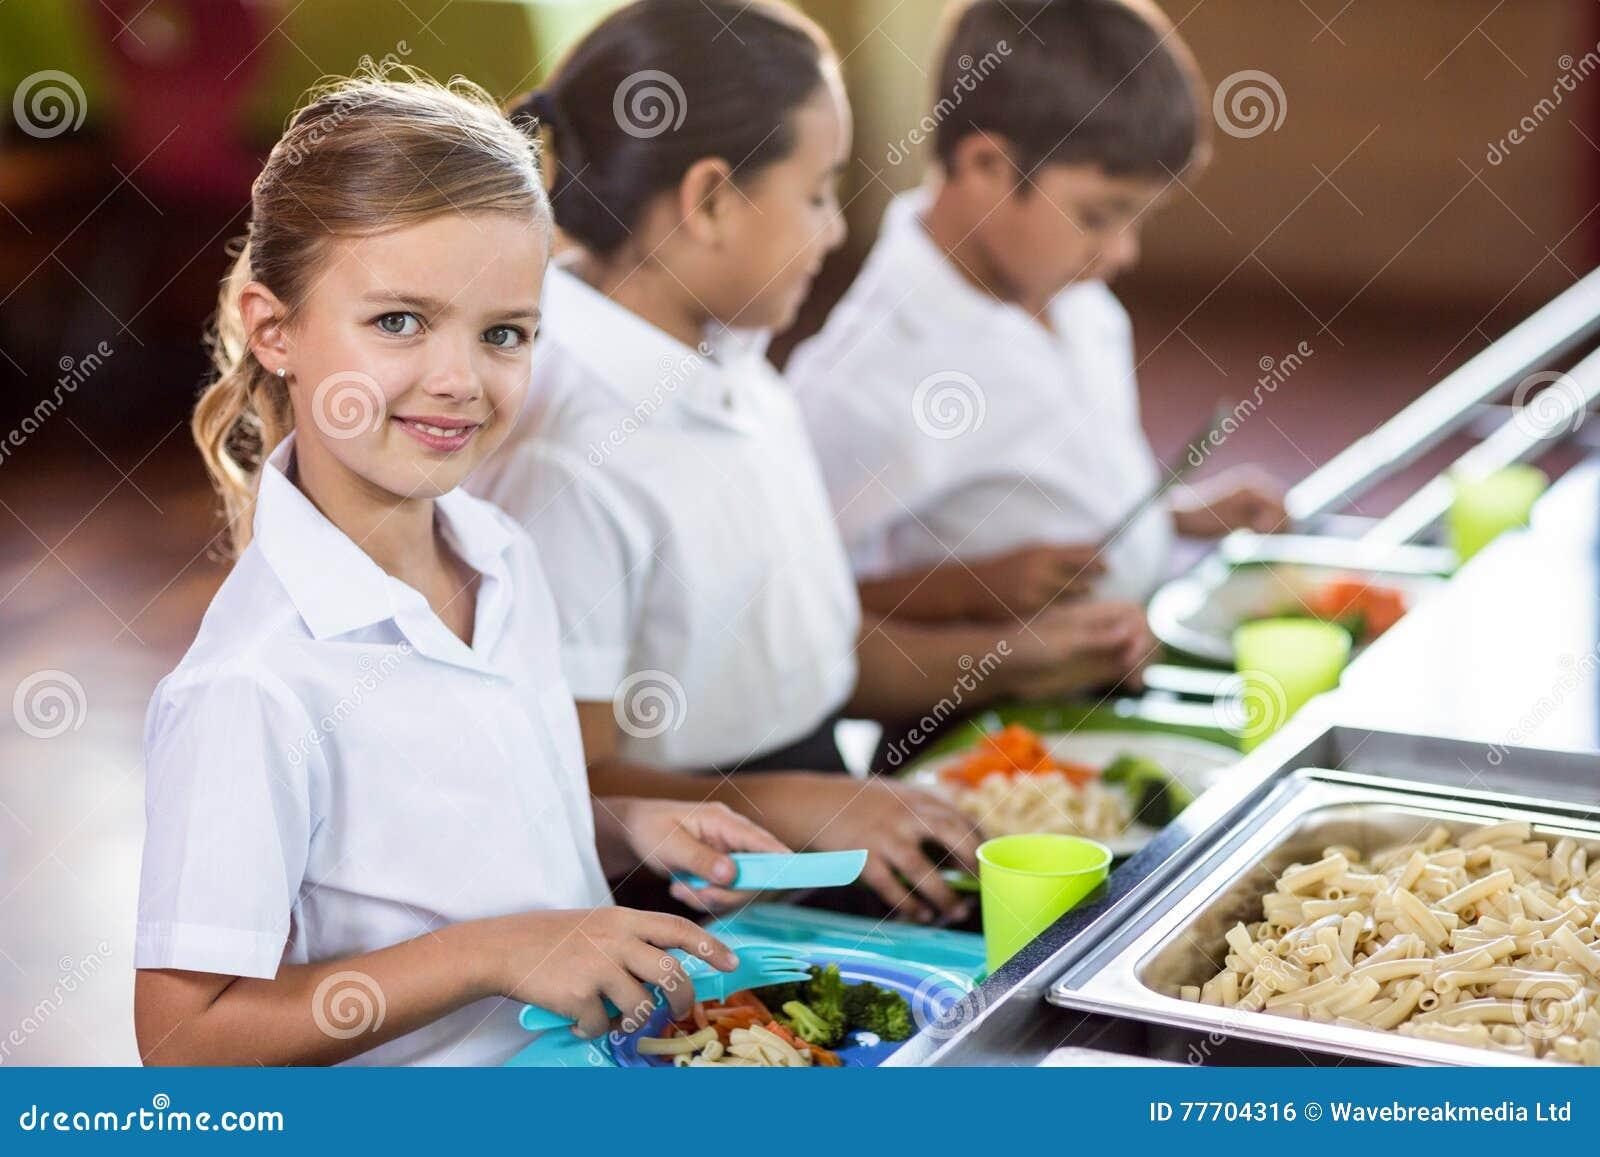 Школьница при одноклассник стоя близко счетчик буфета